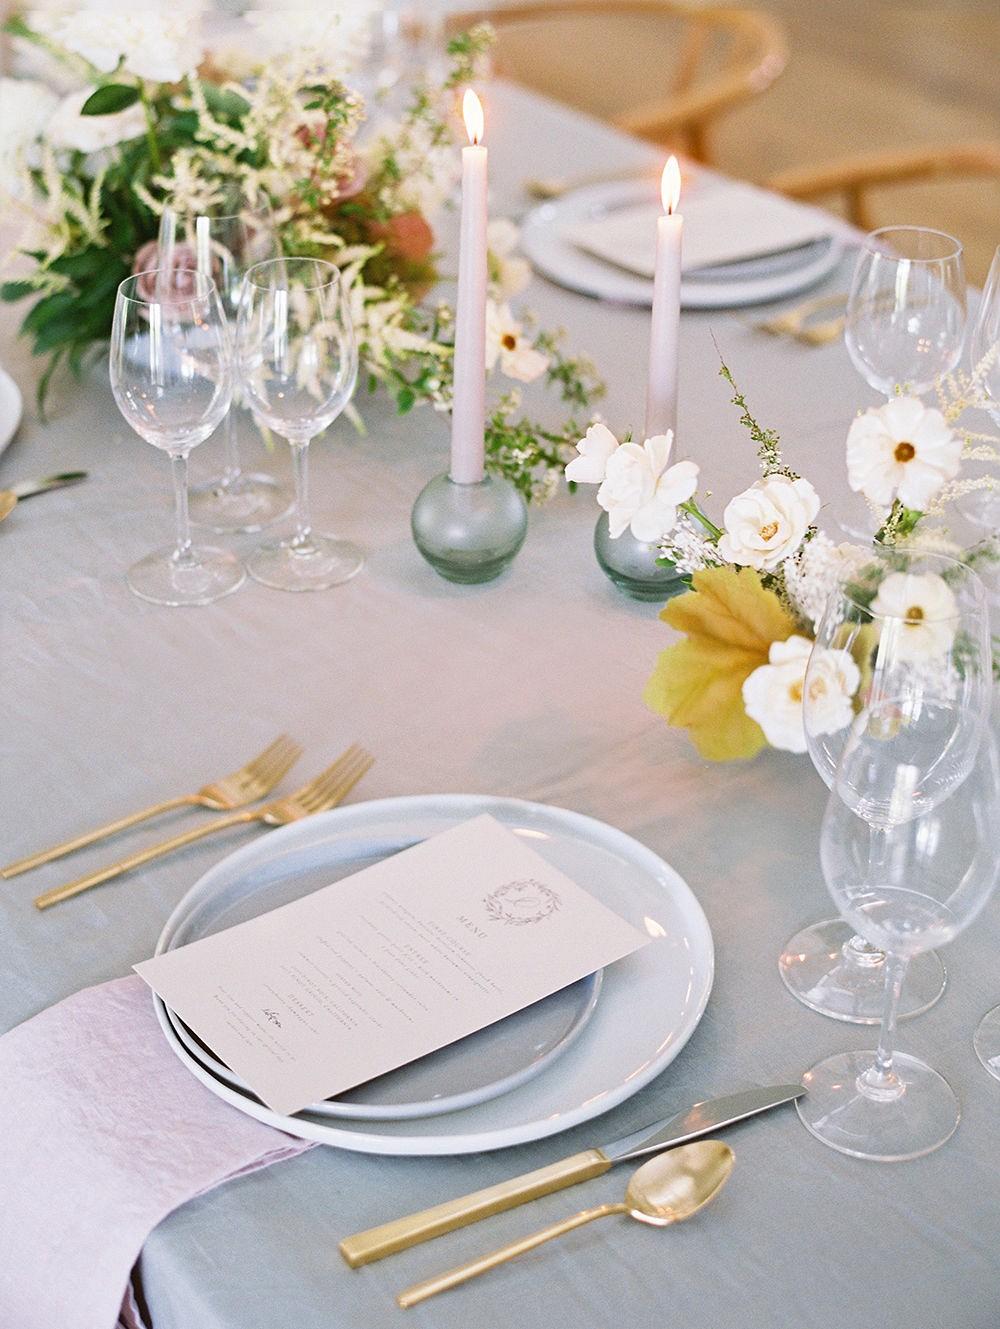 Subtle Late Summer Golden and Mauve Wedding Tablescape Ideas